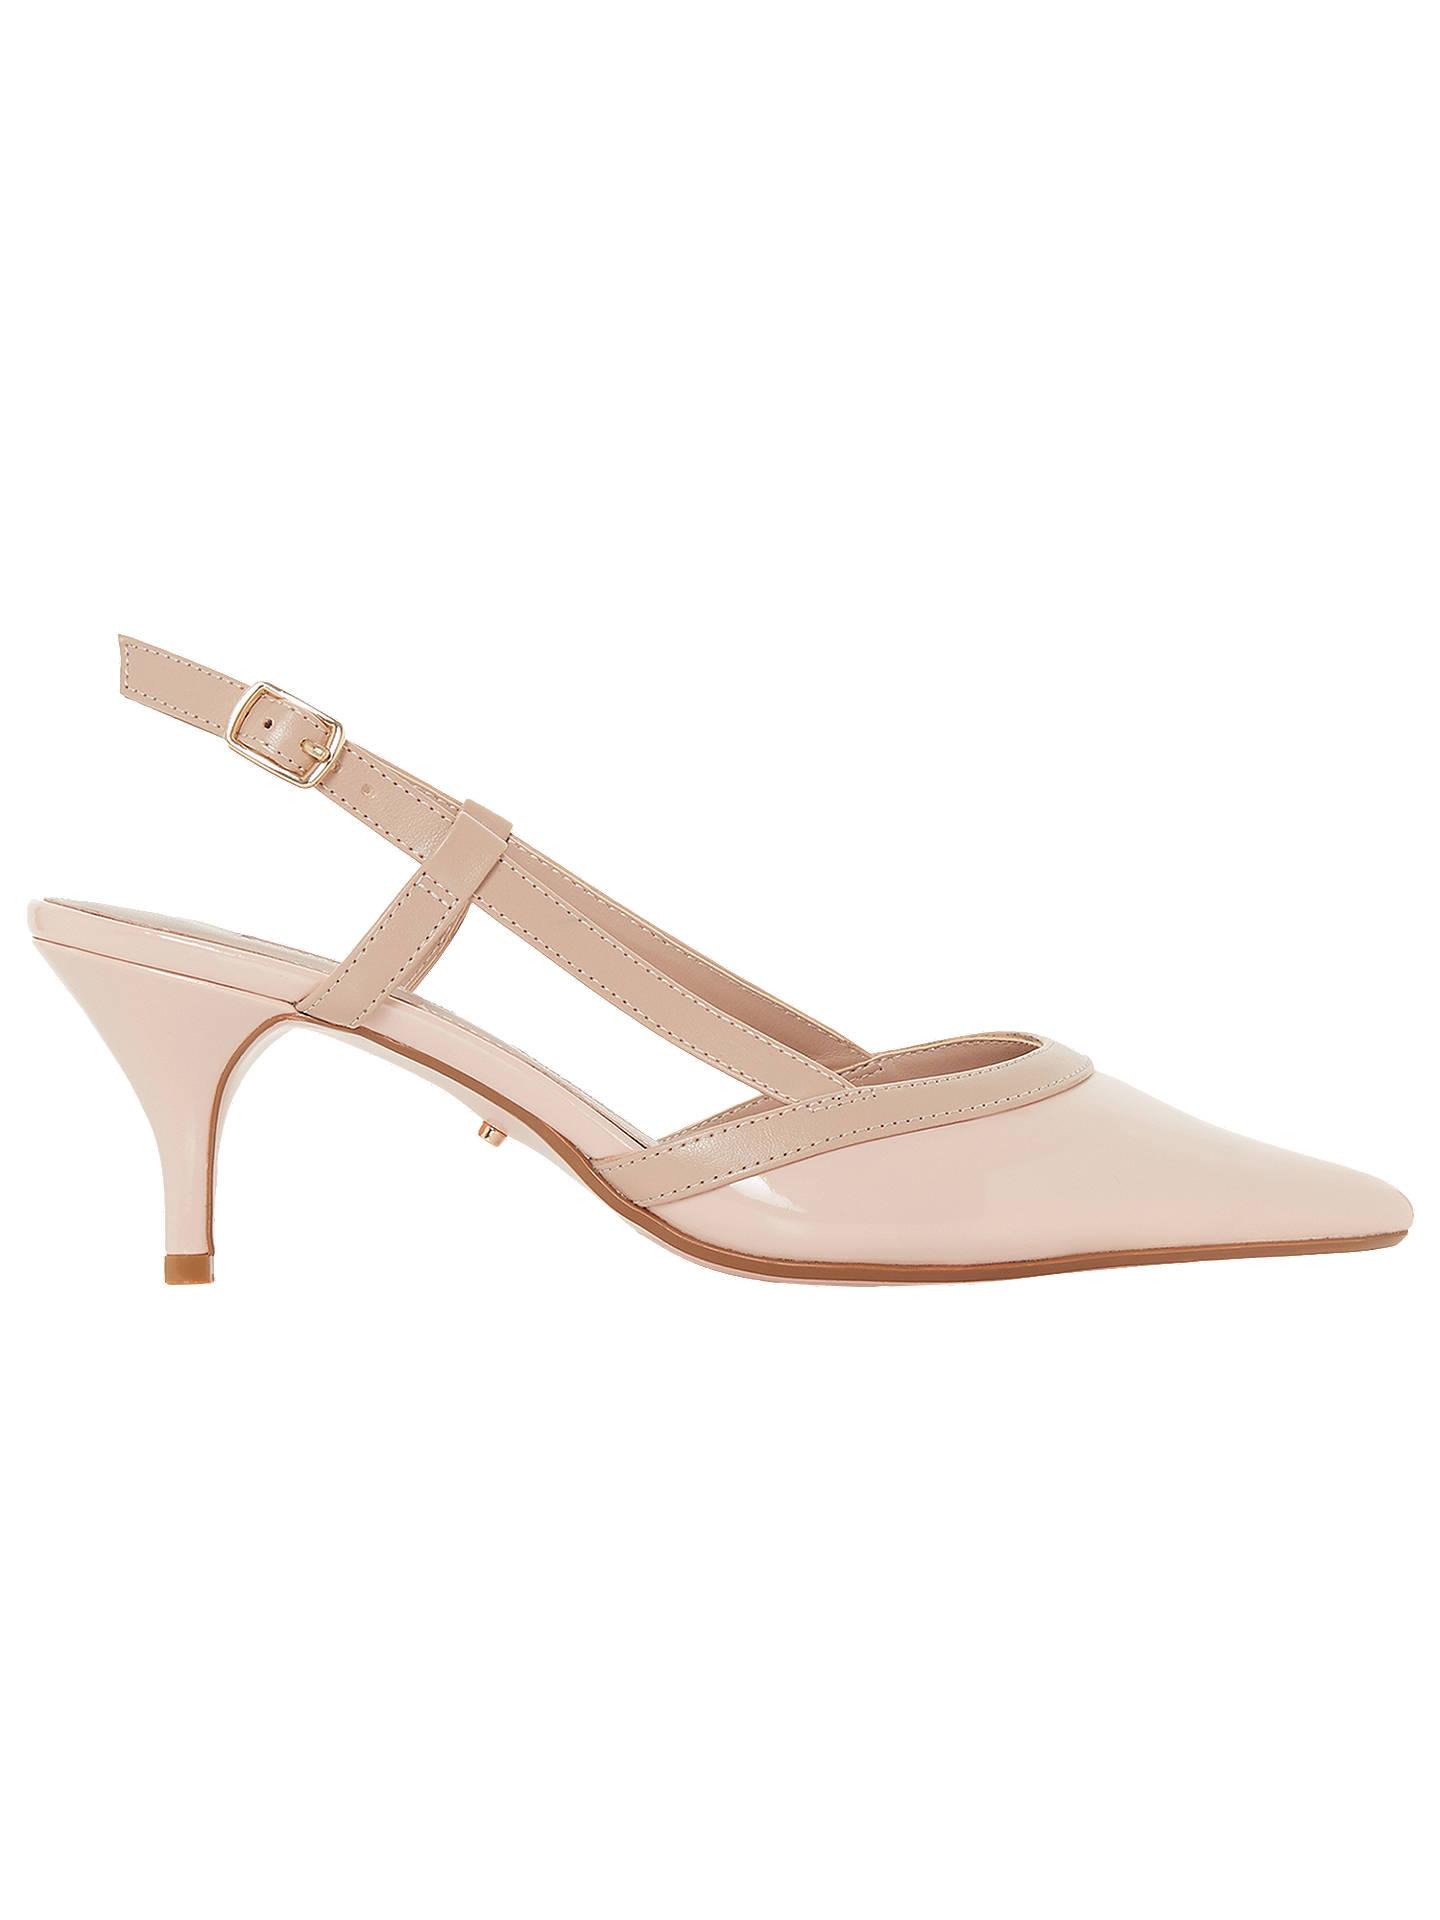 69b3cf7714e Dune Corra Slingback Court Shoes, Pink Patent at John Lewis & Partners